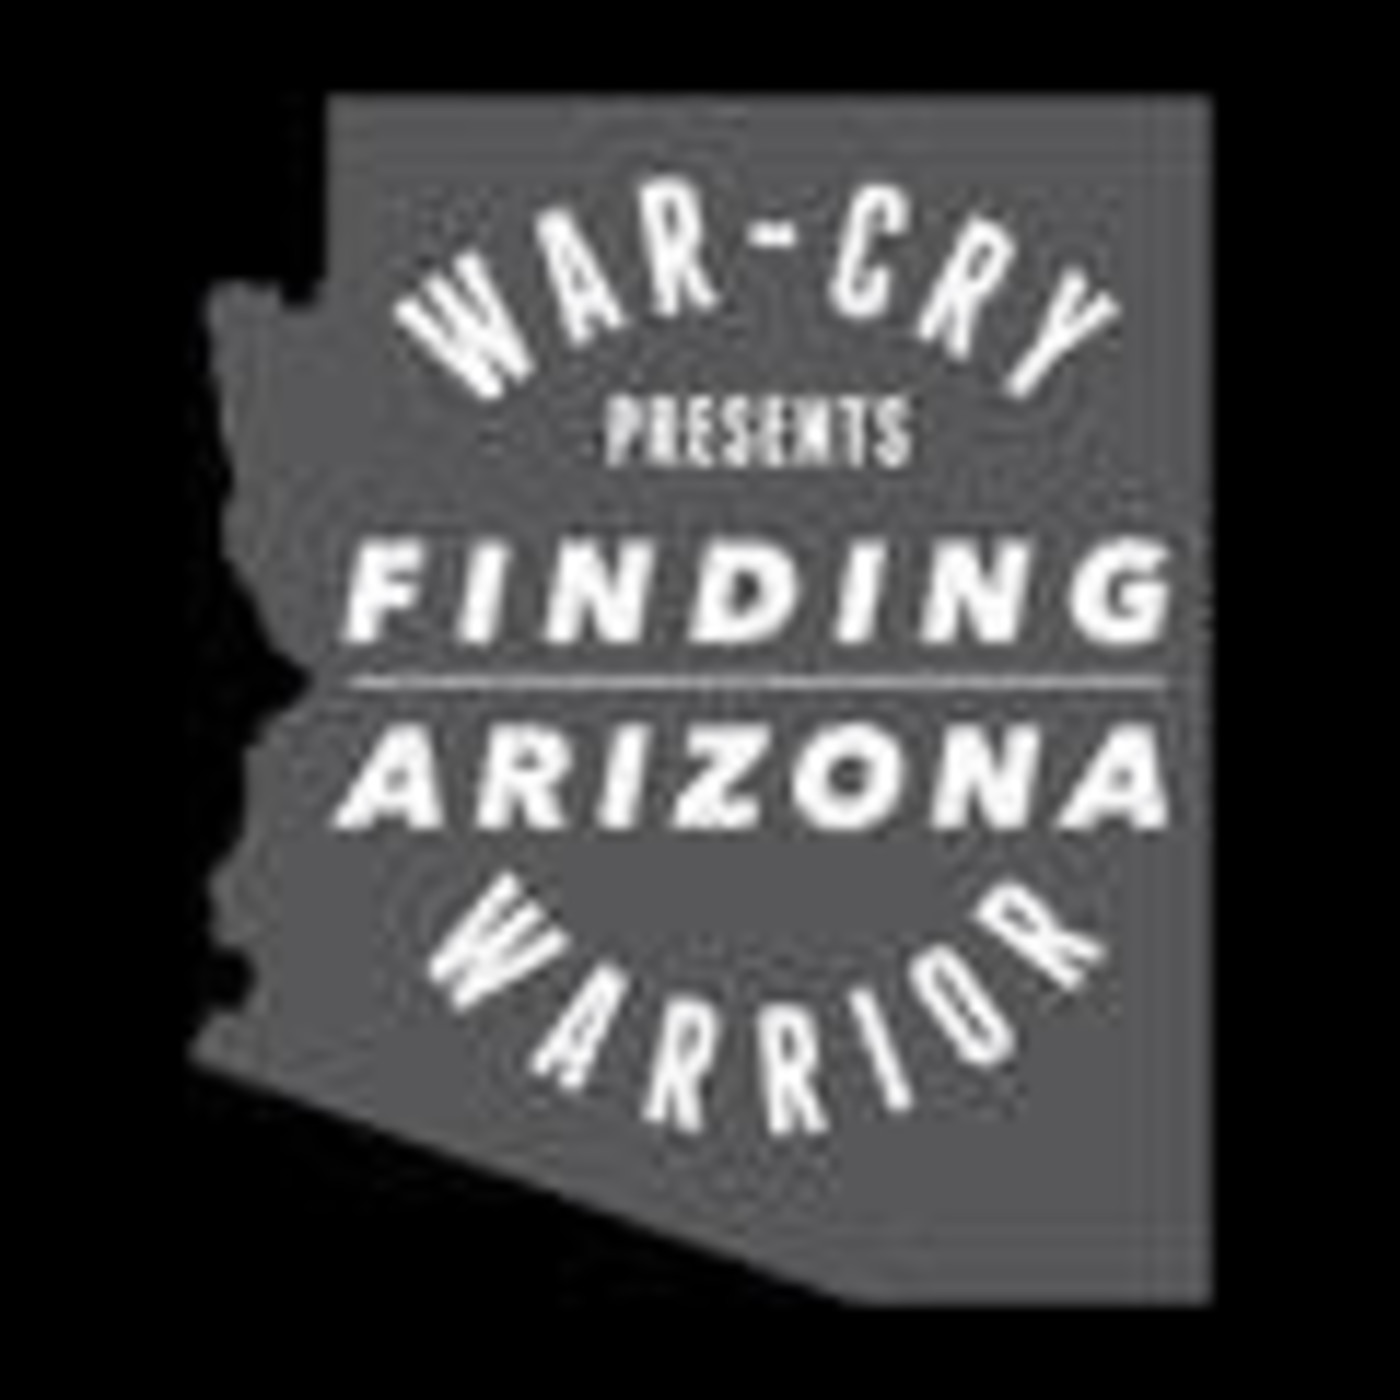 Finding Arizona Podcast